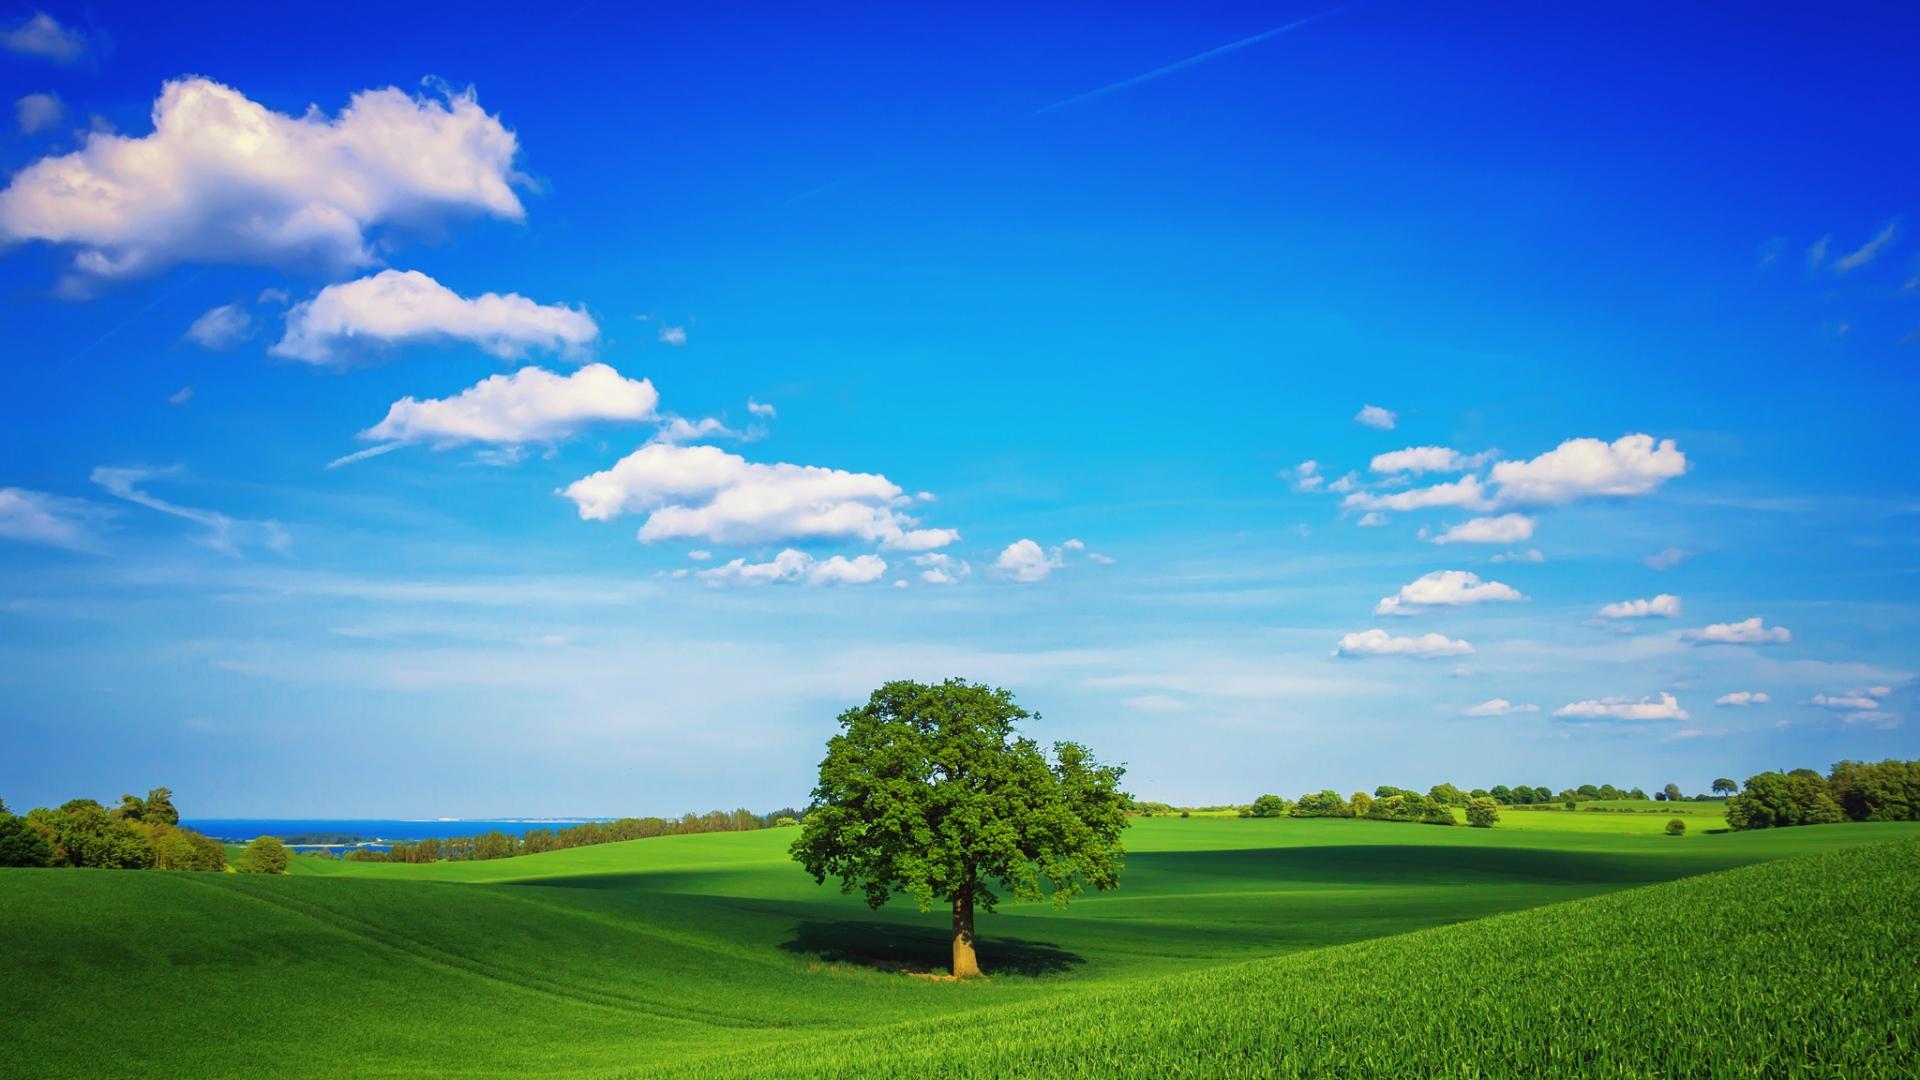 download wallpaper 1920x1080 tree  field  plain  green birch tree vectors free birch tree silhouette vector